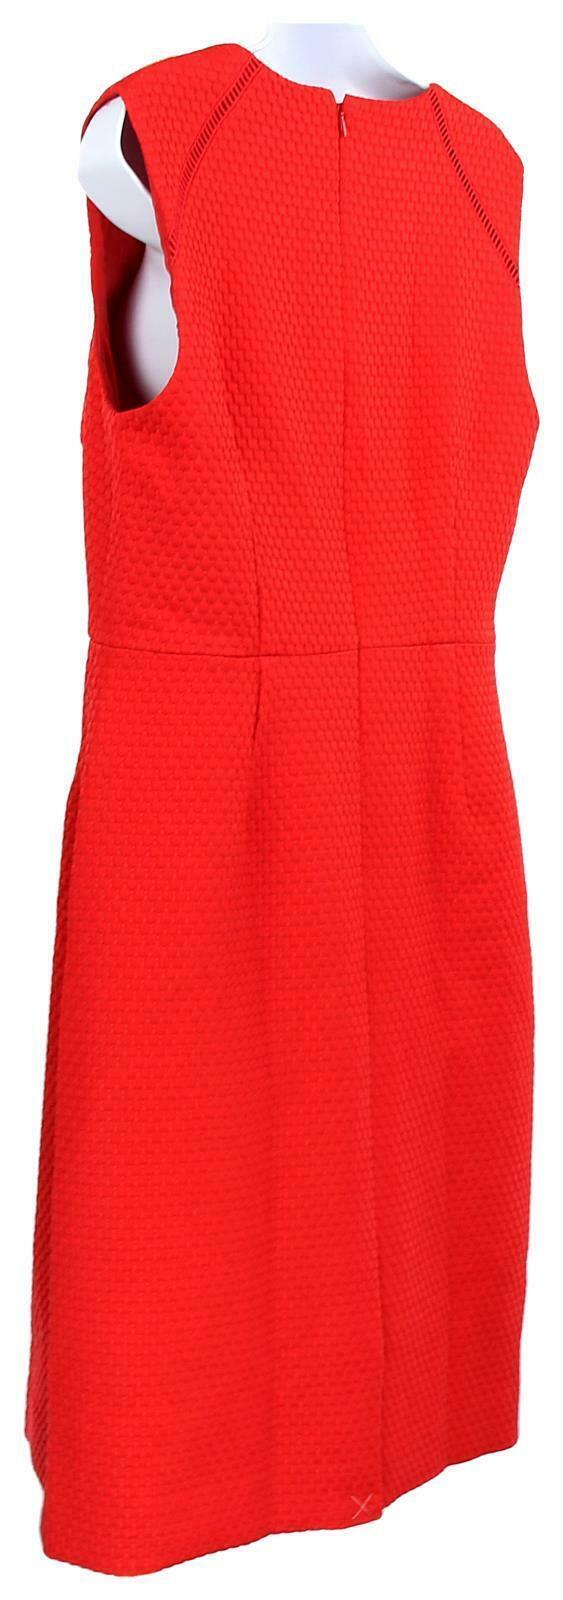 J Crew Women's Portfolio Sheath Dress /Suiting Career Work Red  12 F0791 image 5